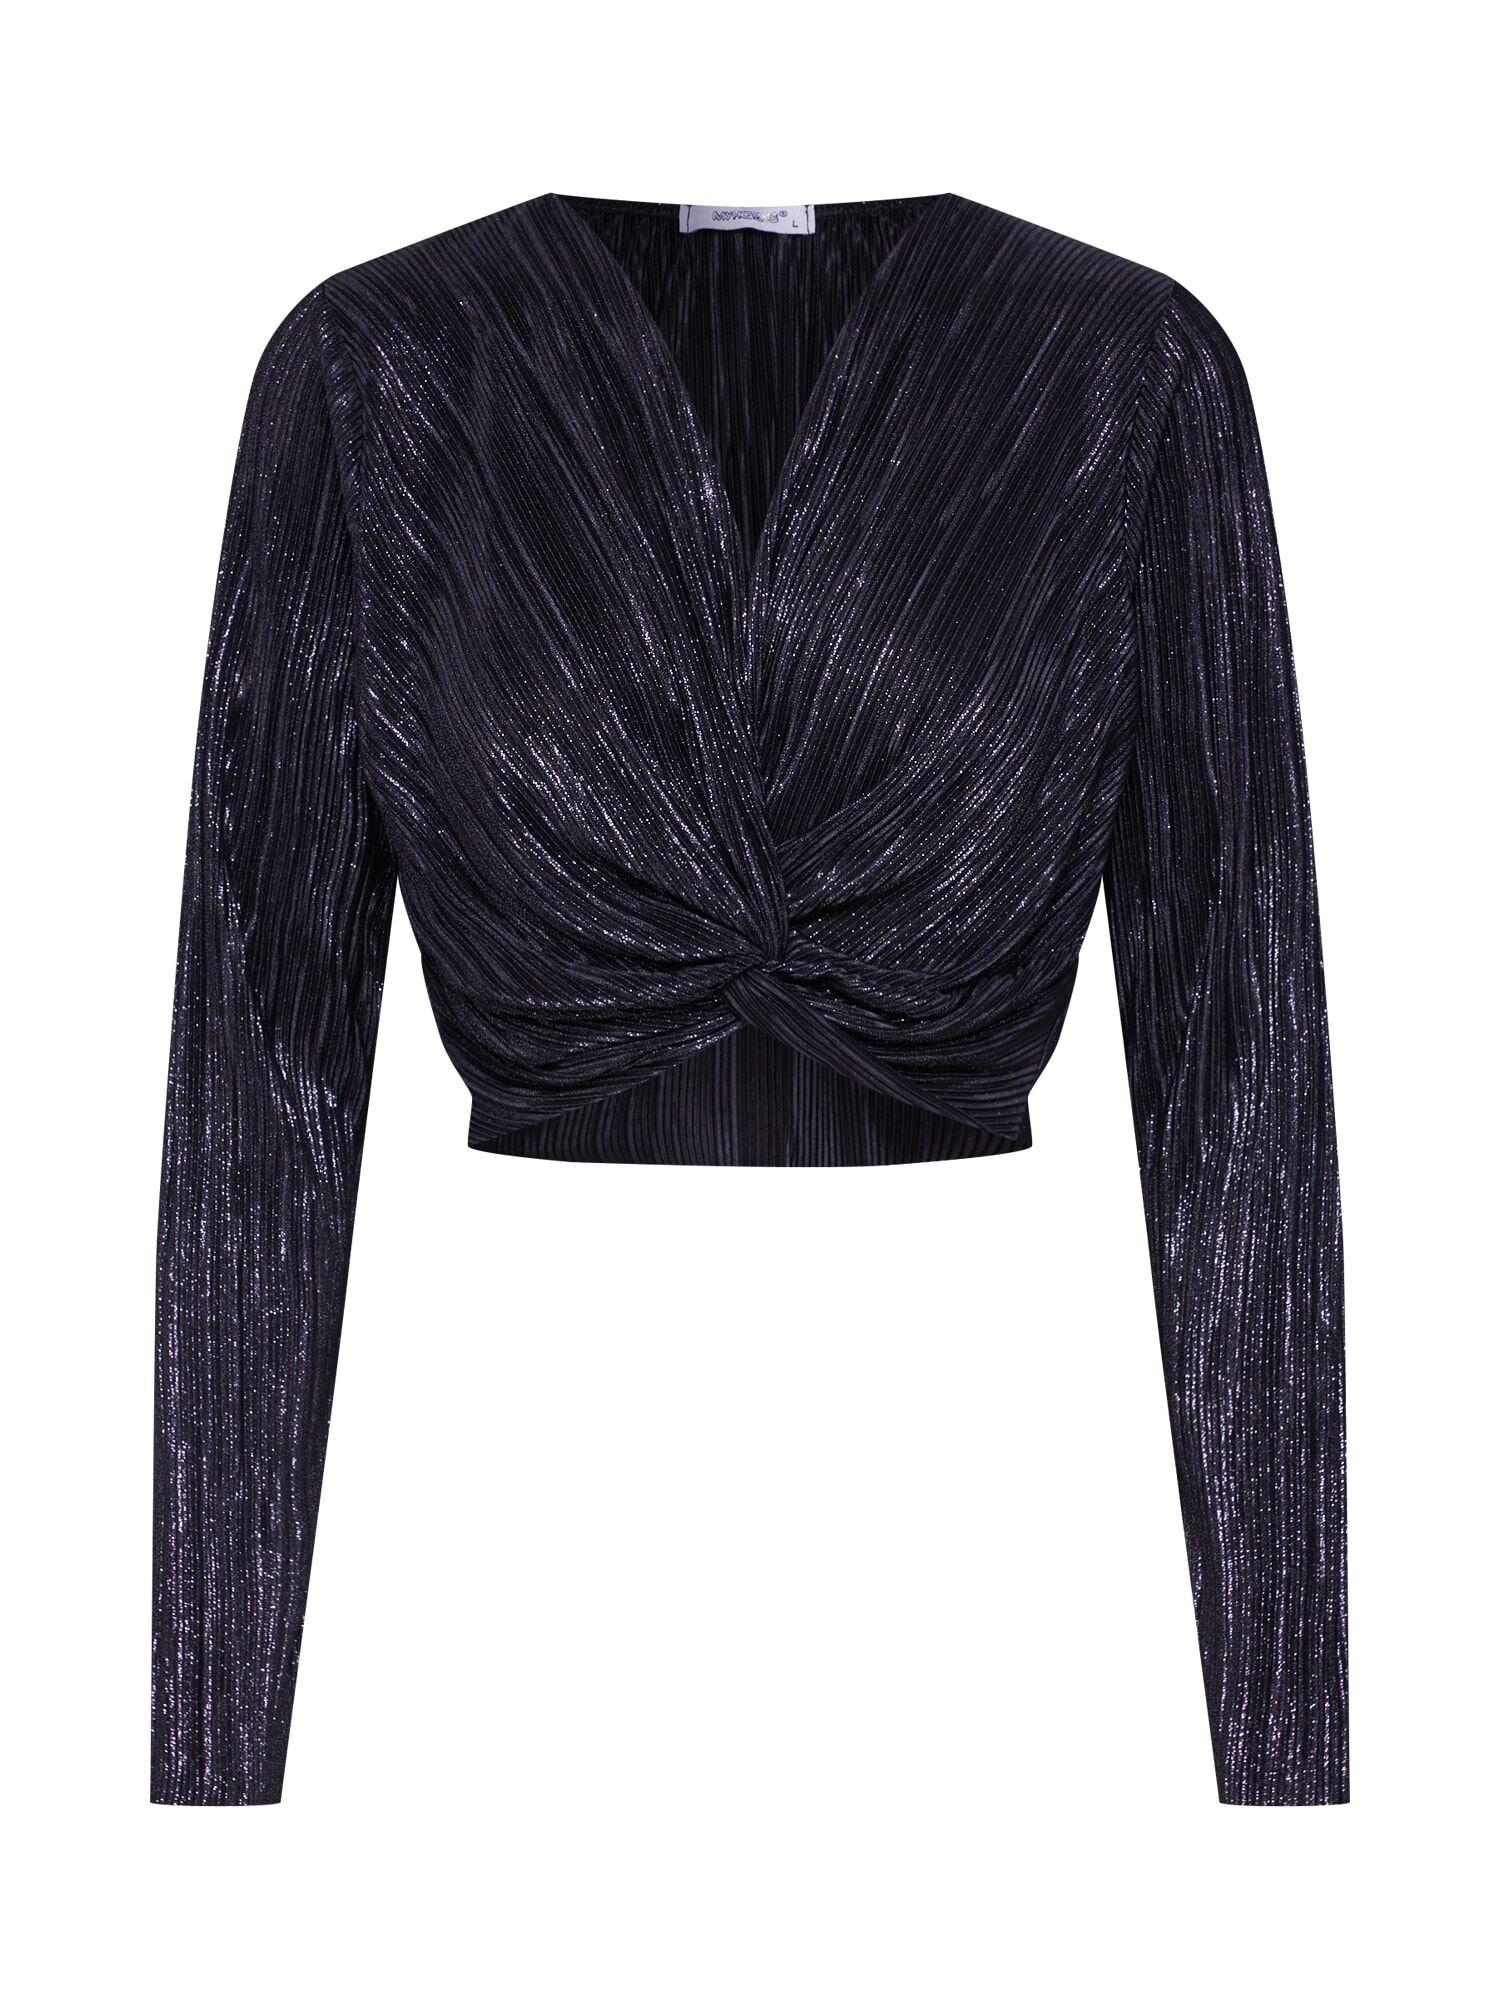 Hailys T-shirt 'LS P TP Lya'  - Noir - Taille: XXL - female